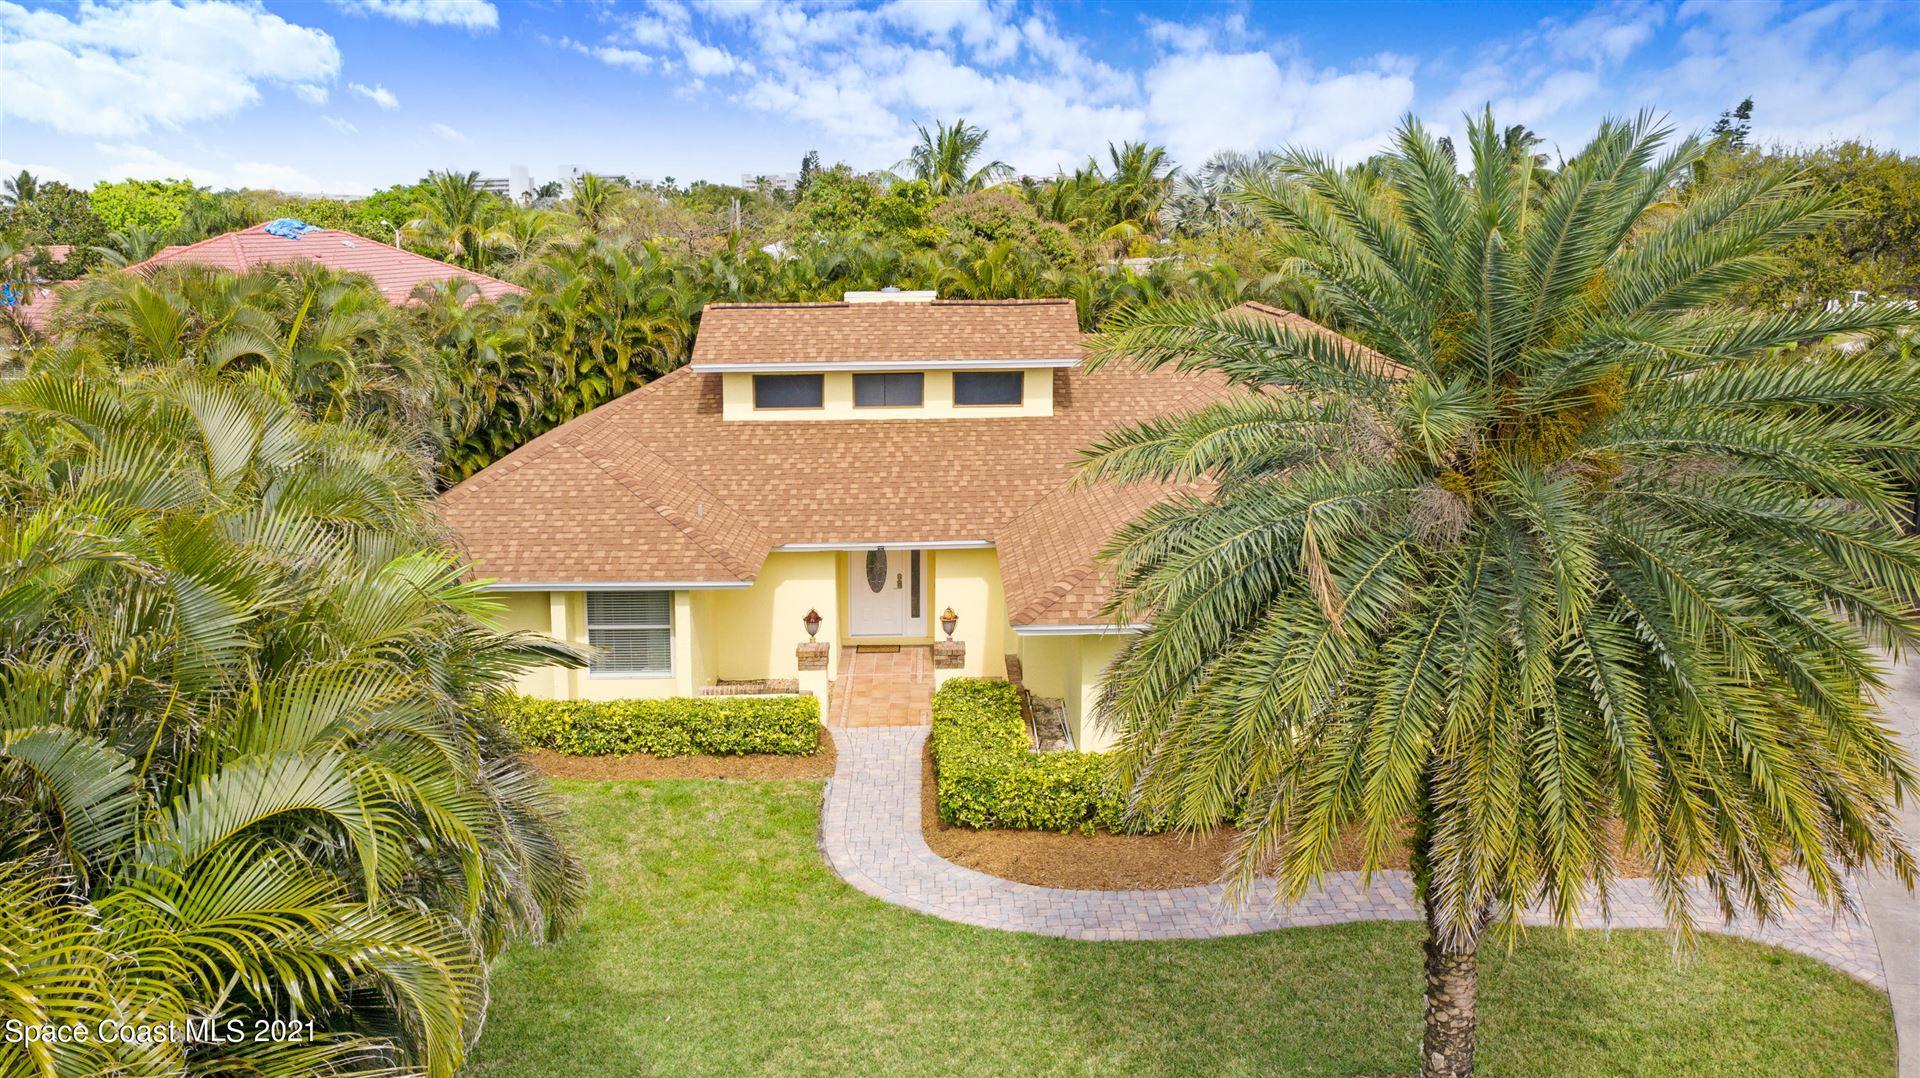 1299 Mosswood Court, Indialantic, FL 32903 - #: 898315